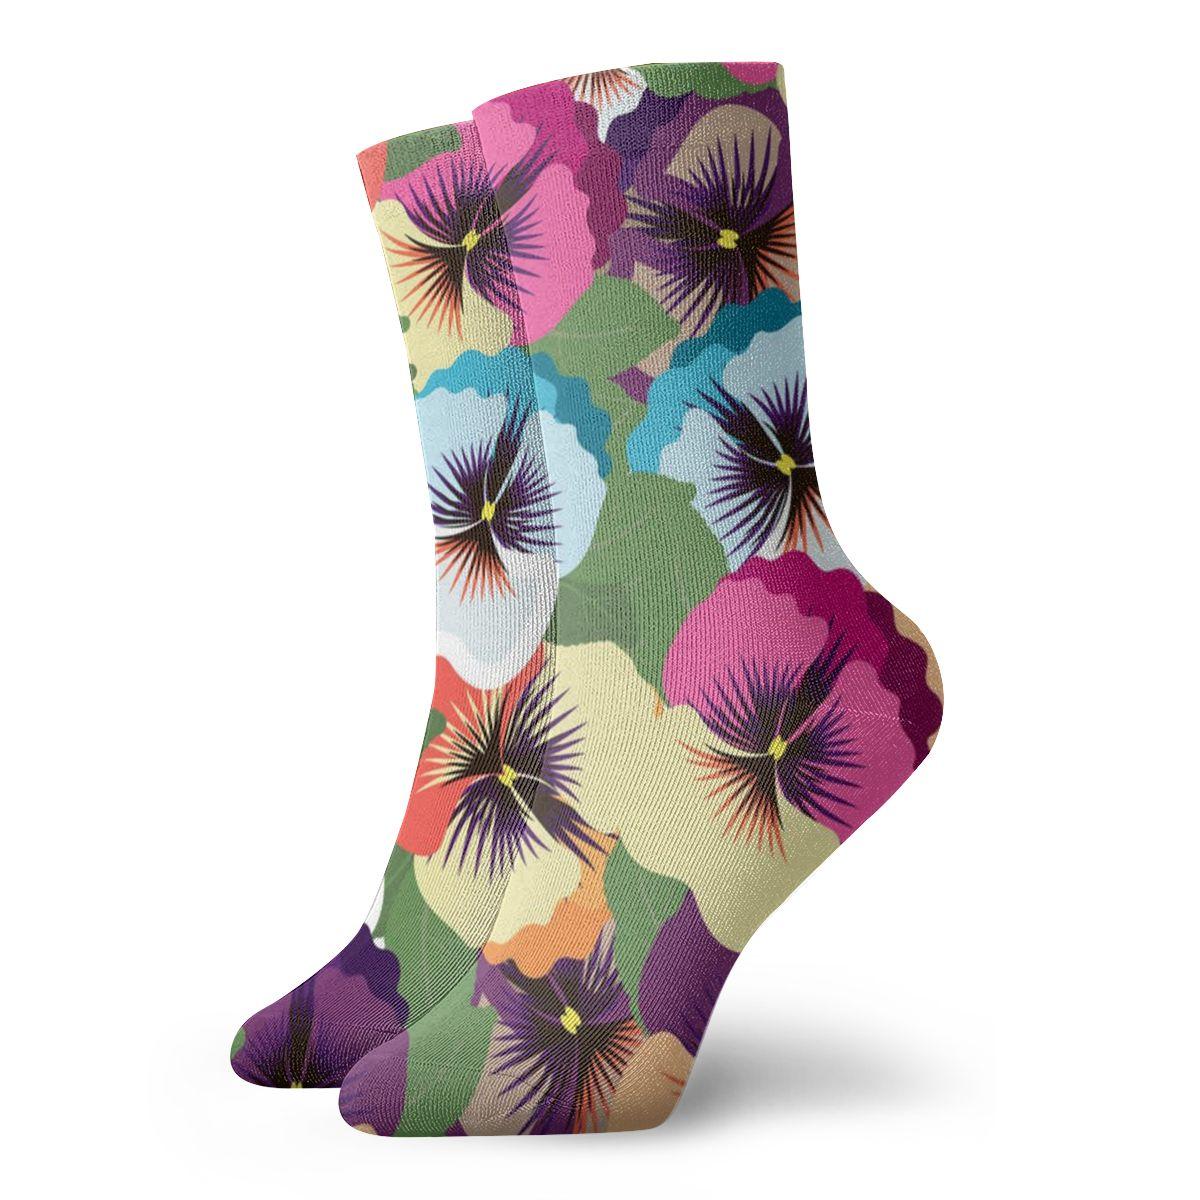 NOISYDESIGNS Fashion Kawaii Socks Floral Print Pansy Flowers Ankle Short Socks For Lady Girls Summer Spring Socks Women New